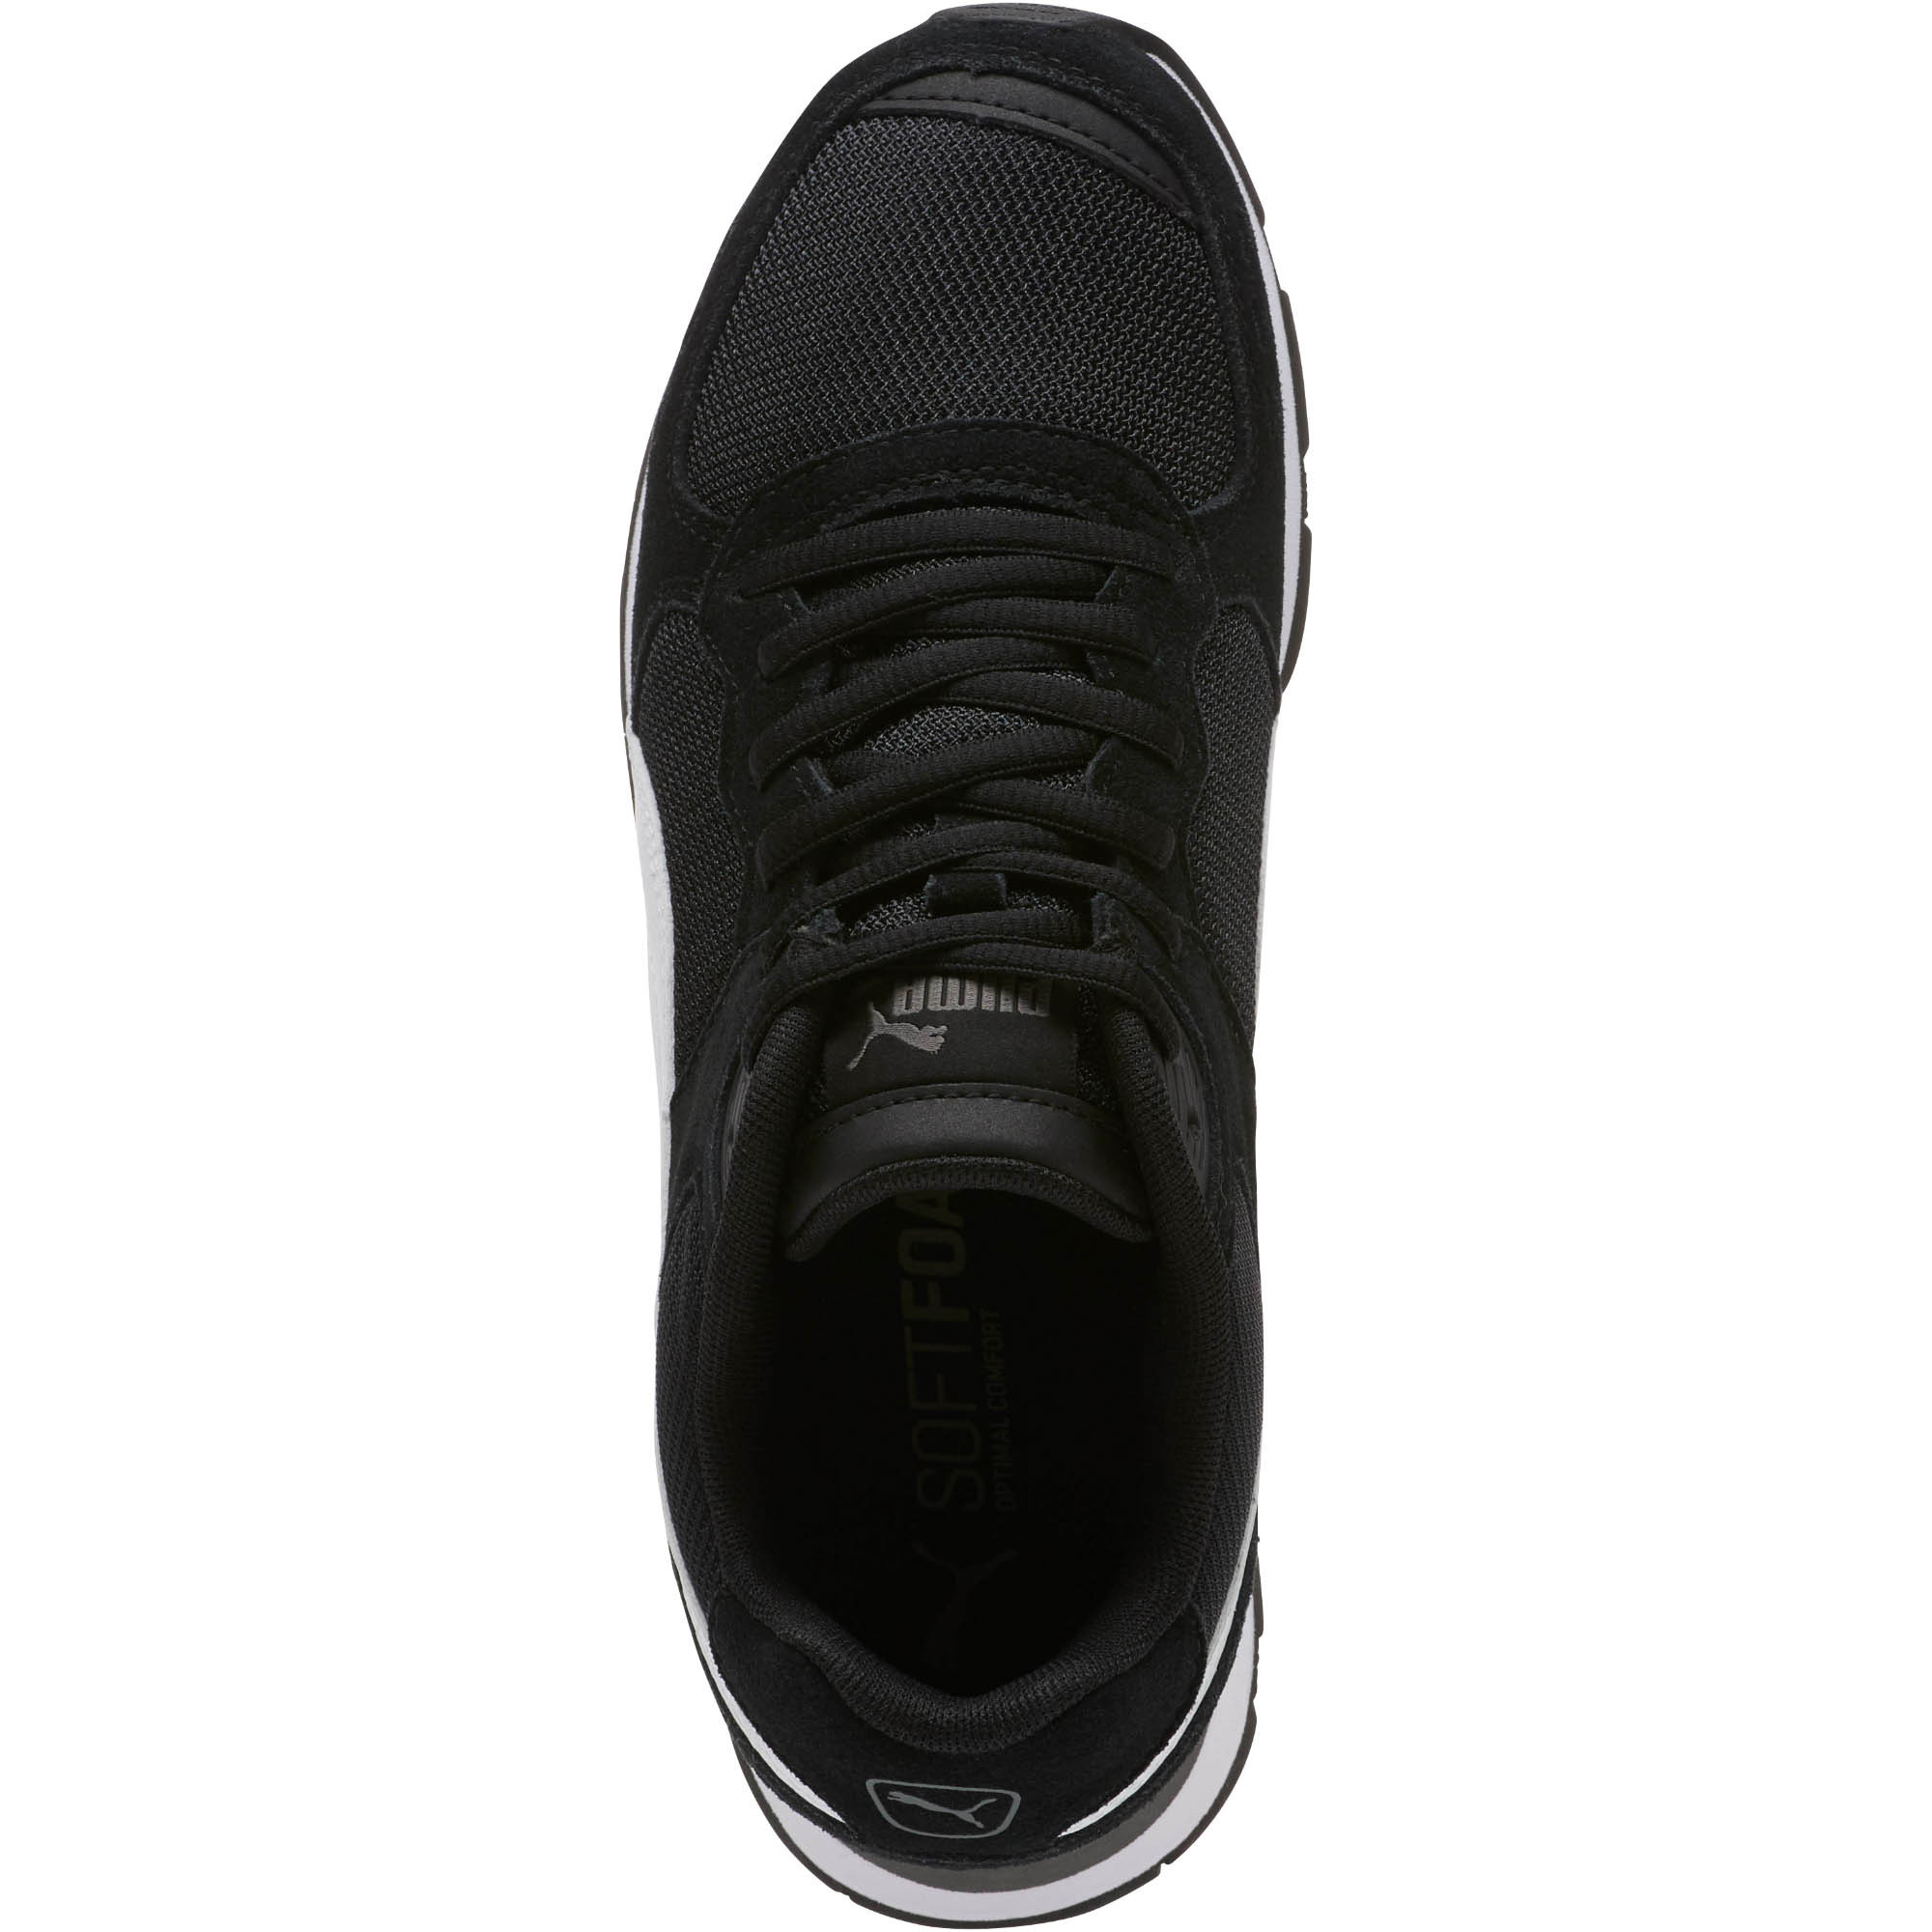 PUMA-Vista-Women-s-Sneakers-Women-Shoe-Basics thumbnail 6